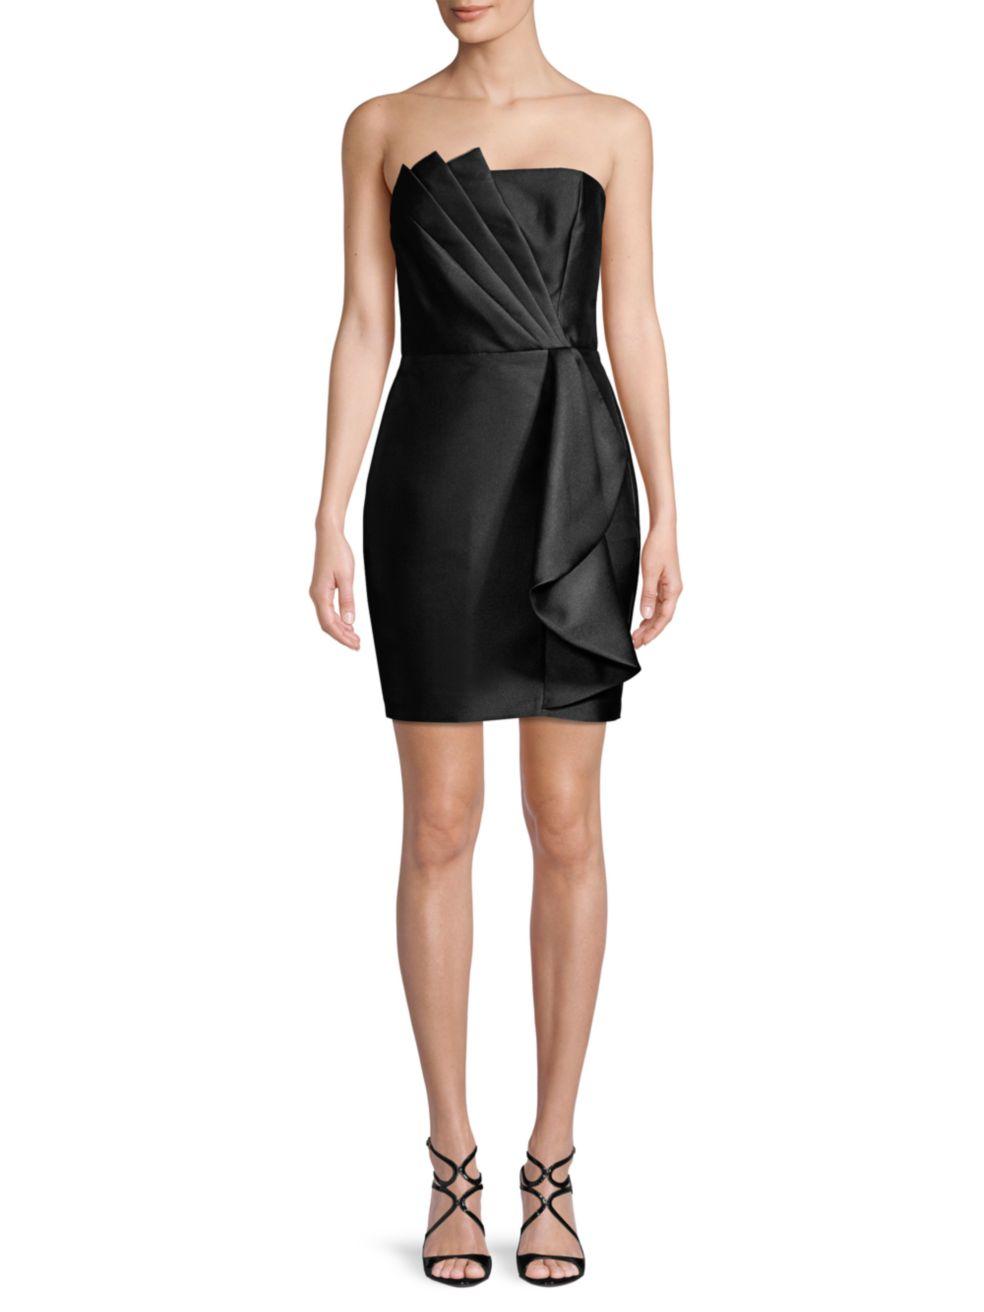 Parker Black Merida Strapless Satin Mini Dress   SaksFifthAvenue